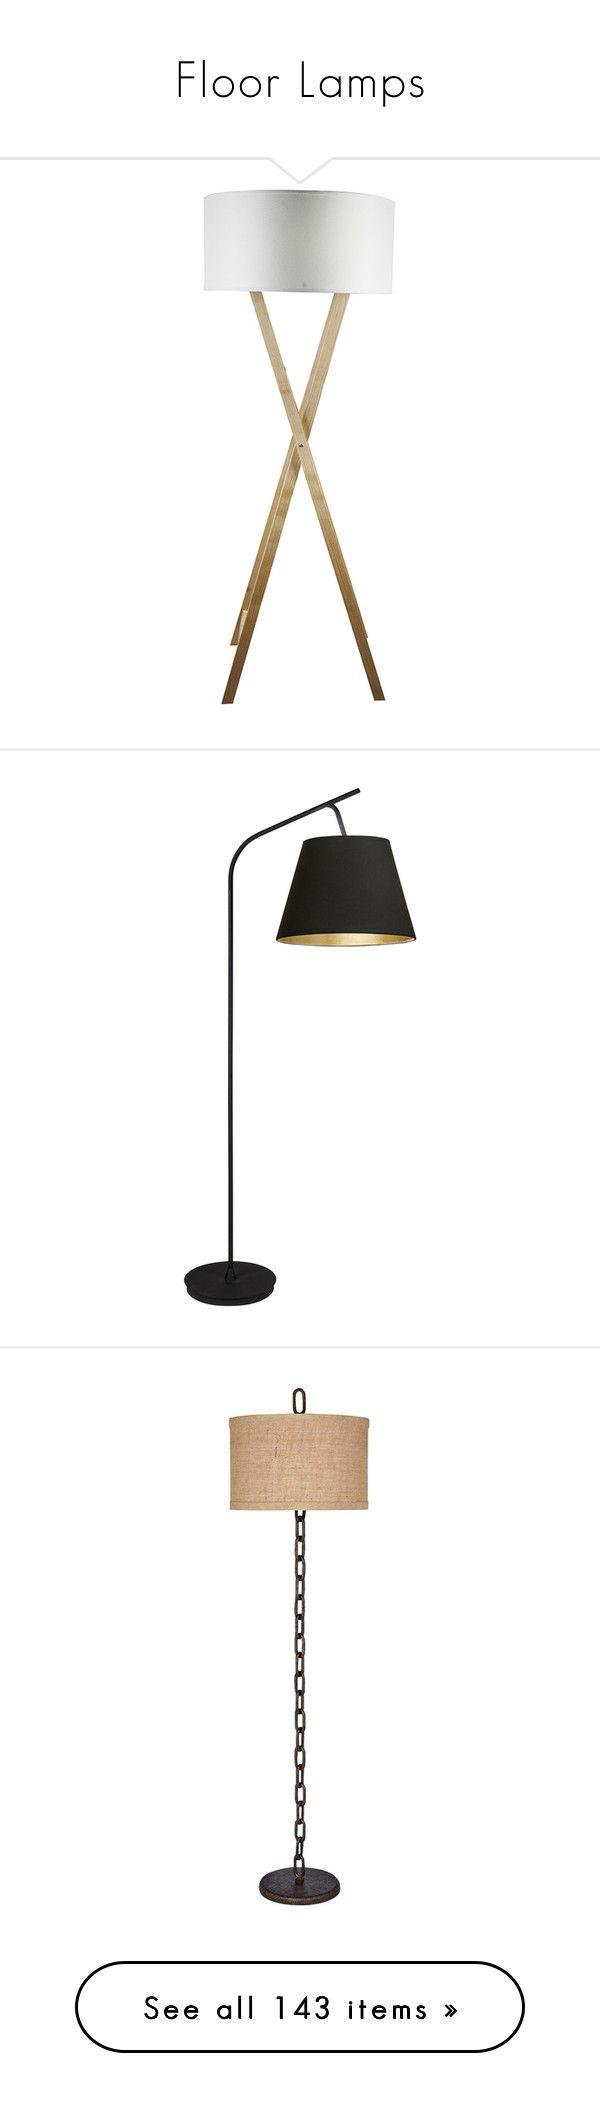 Best 25 wooden floor lamps ideas on pinterest diy wooden floor floor lamps by sally simpson on polyvore featuring home lighting floor lamps aloadofball Images